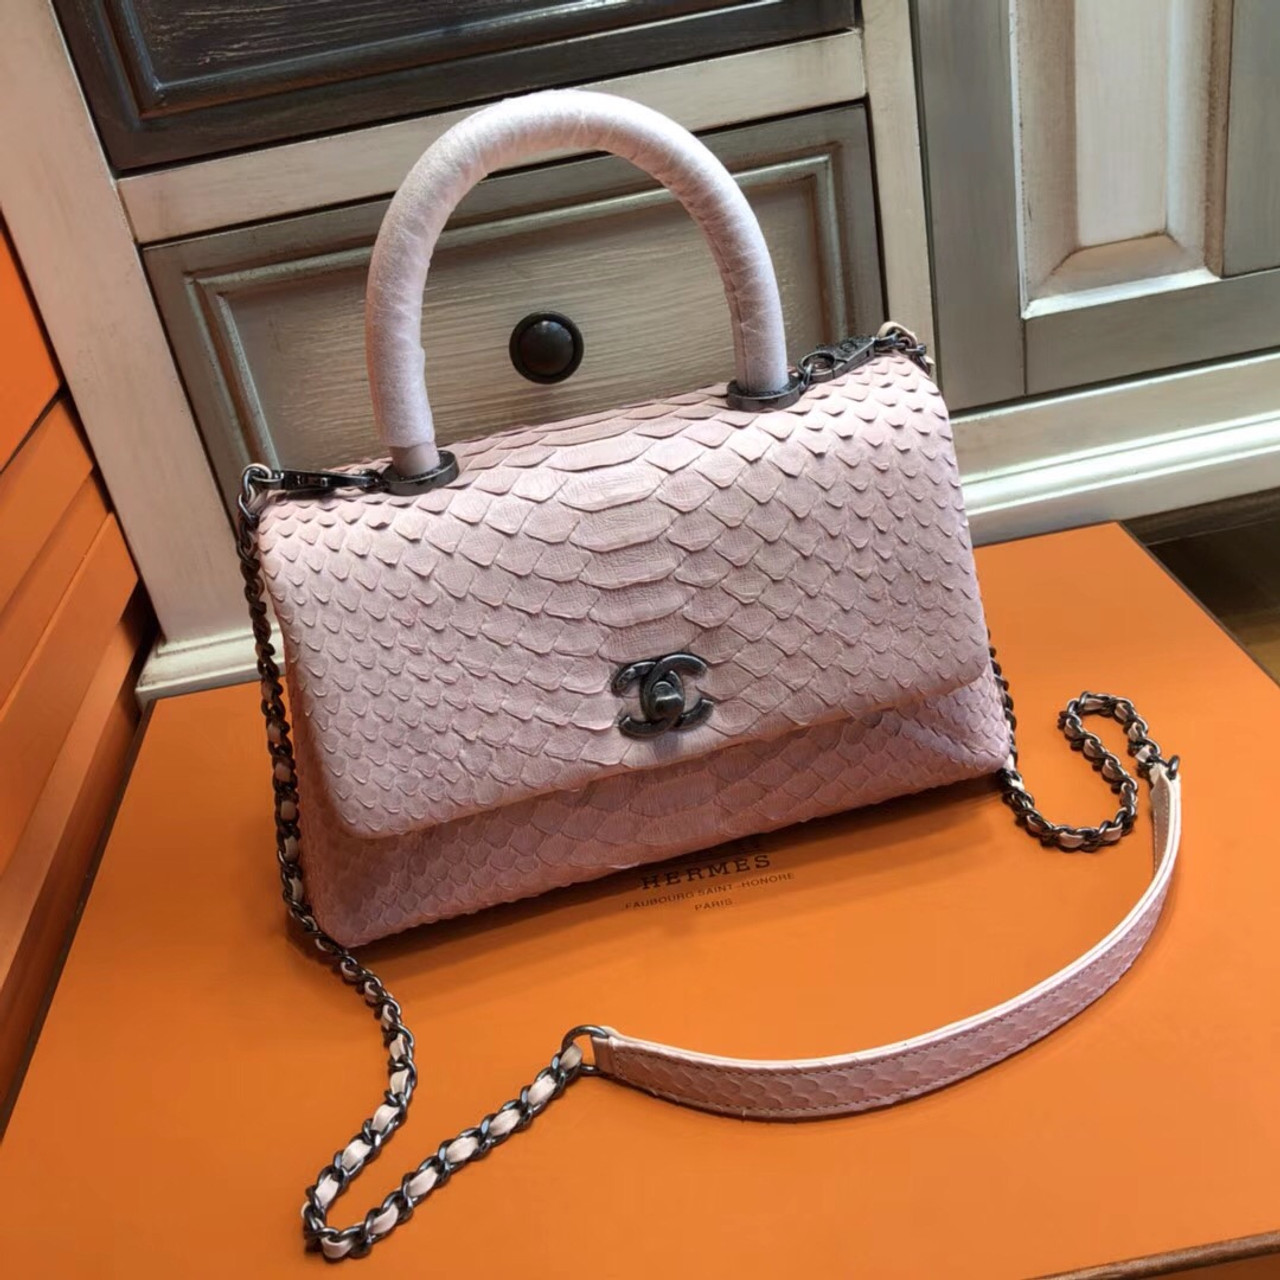 57f435e23a62 Chanel Pink Python Flap Bag with top handle - Bella Vita Moda